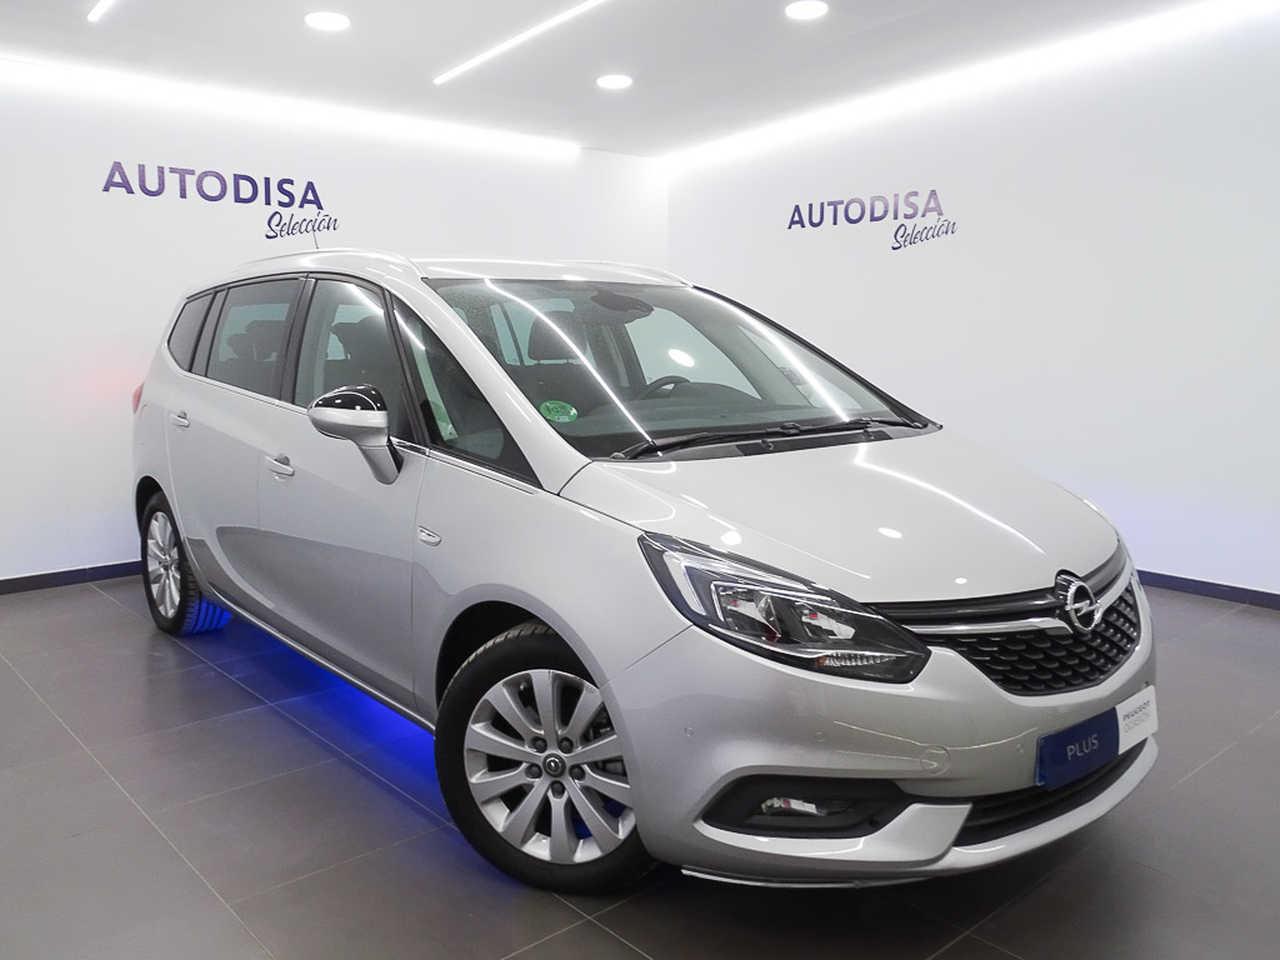 Opel Zafira 1.4T S&S 140 EXCELLENCE AUTO